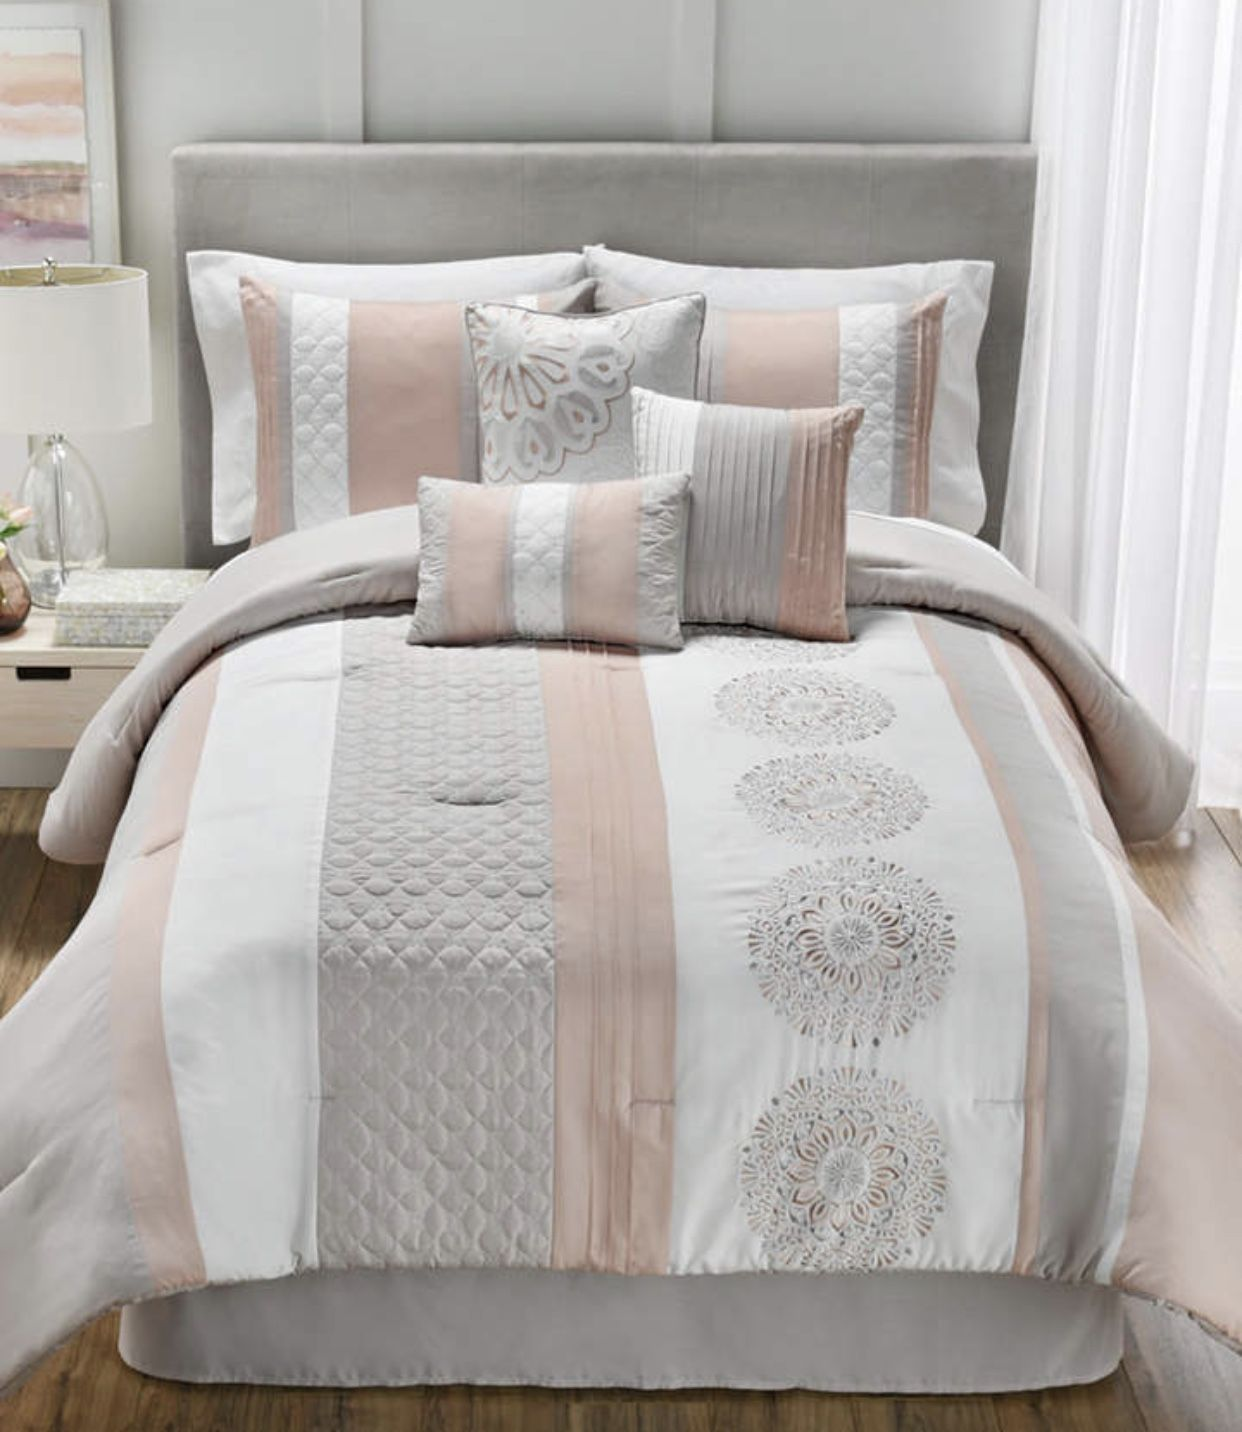 Blush Pink And Gray Bedroom Comforter Homedecor Interior Design Blush Decorate Decor Ideas Luxury Bedroom Design Luxurious Bedrooms Comforter Sets